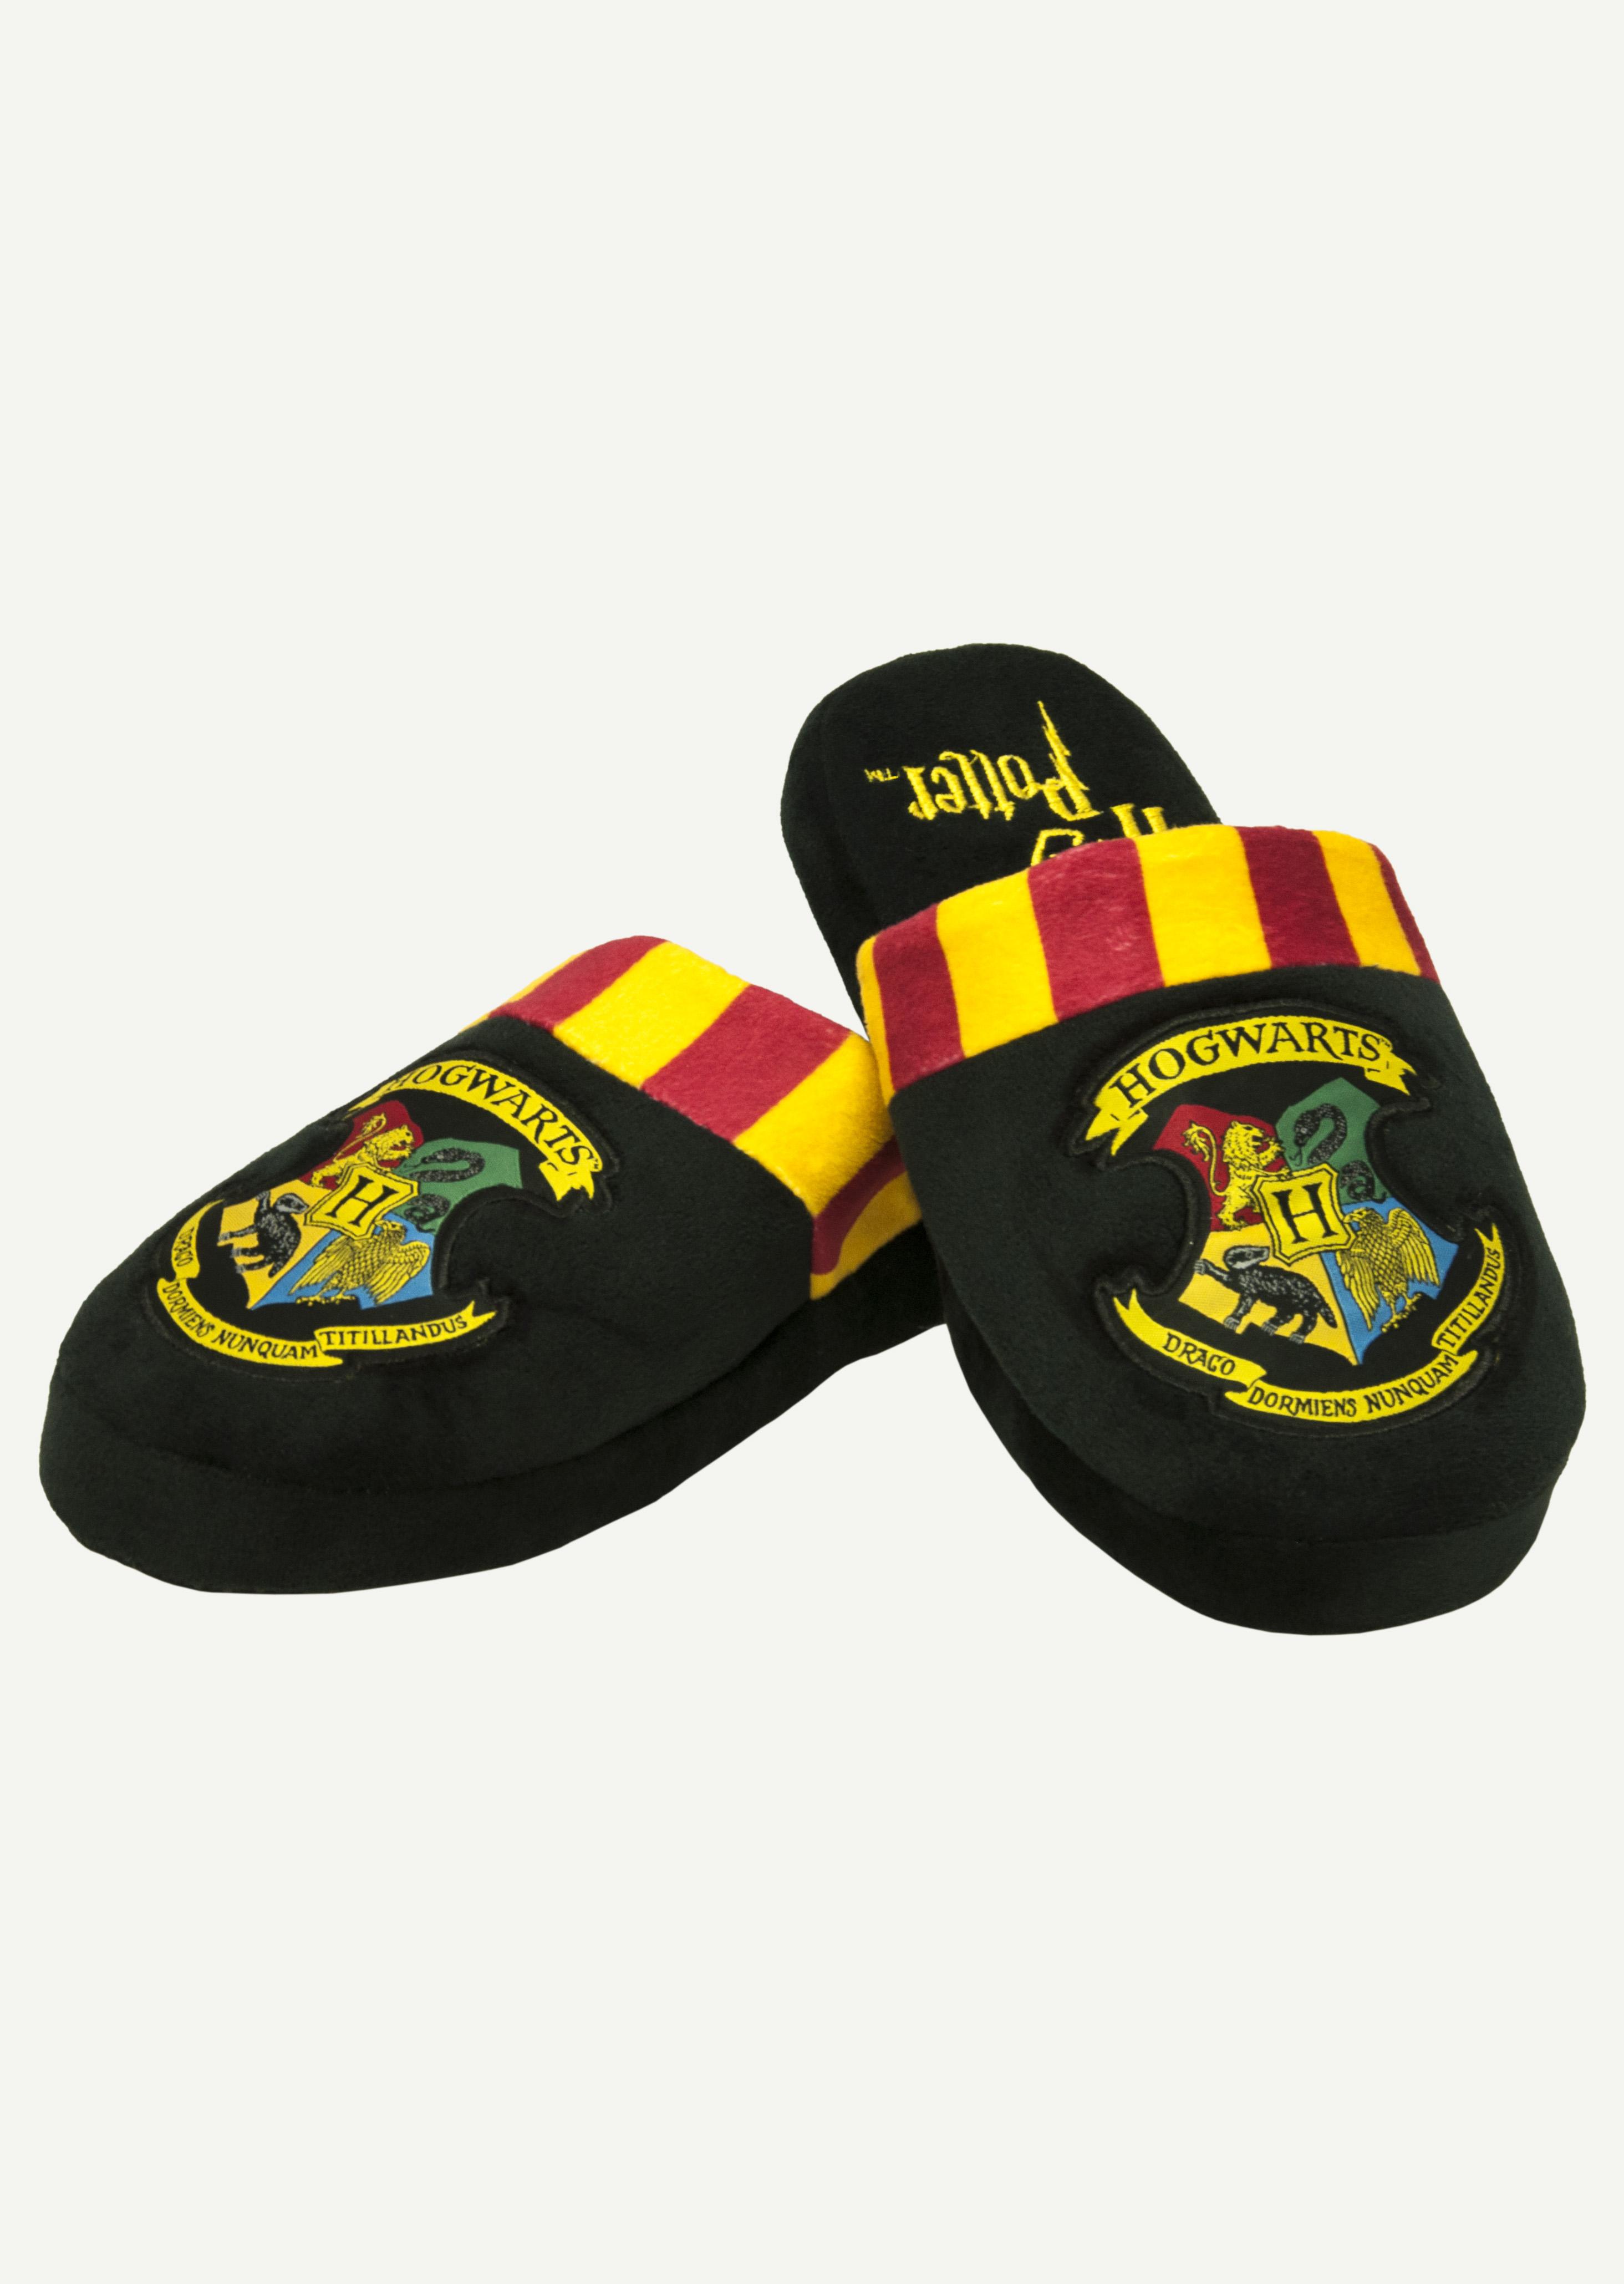 Groovy Rokfortské papuče Harry Potter Veľkosť papuče: 38-41